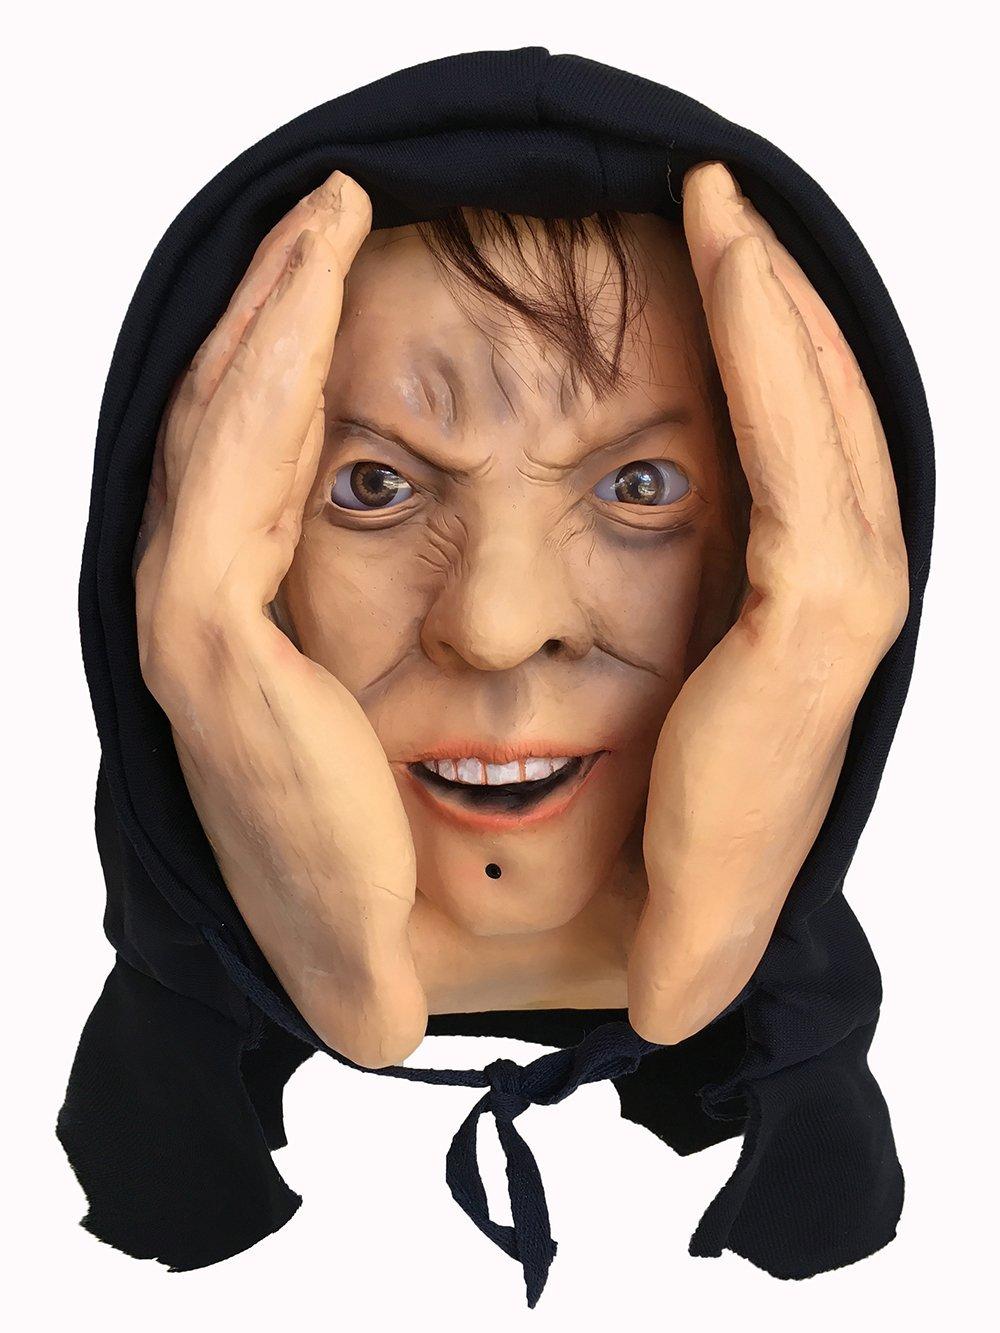 motion sensor animated eyes scary peeper creeper window prop halloween haunted house prank decoration display